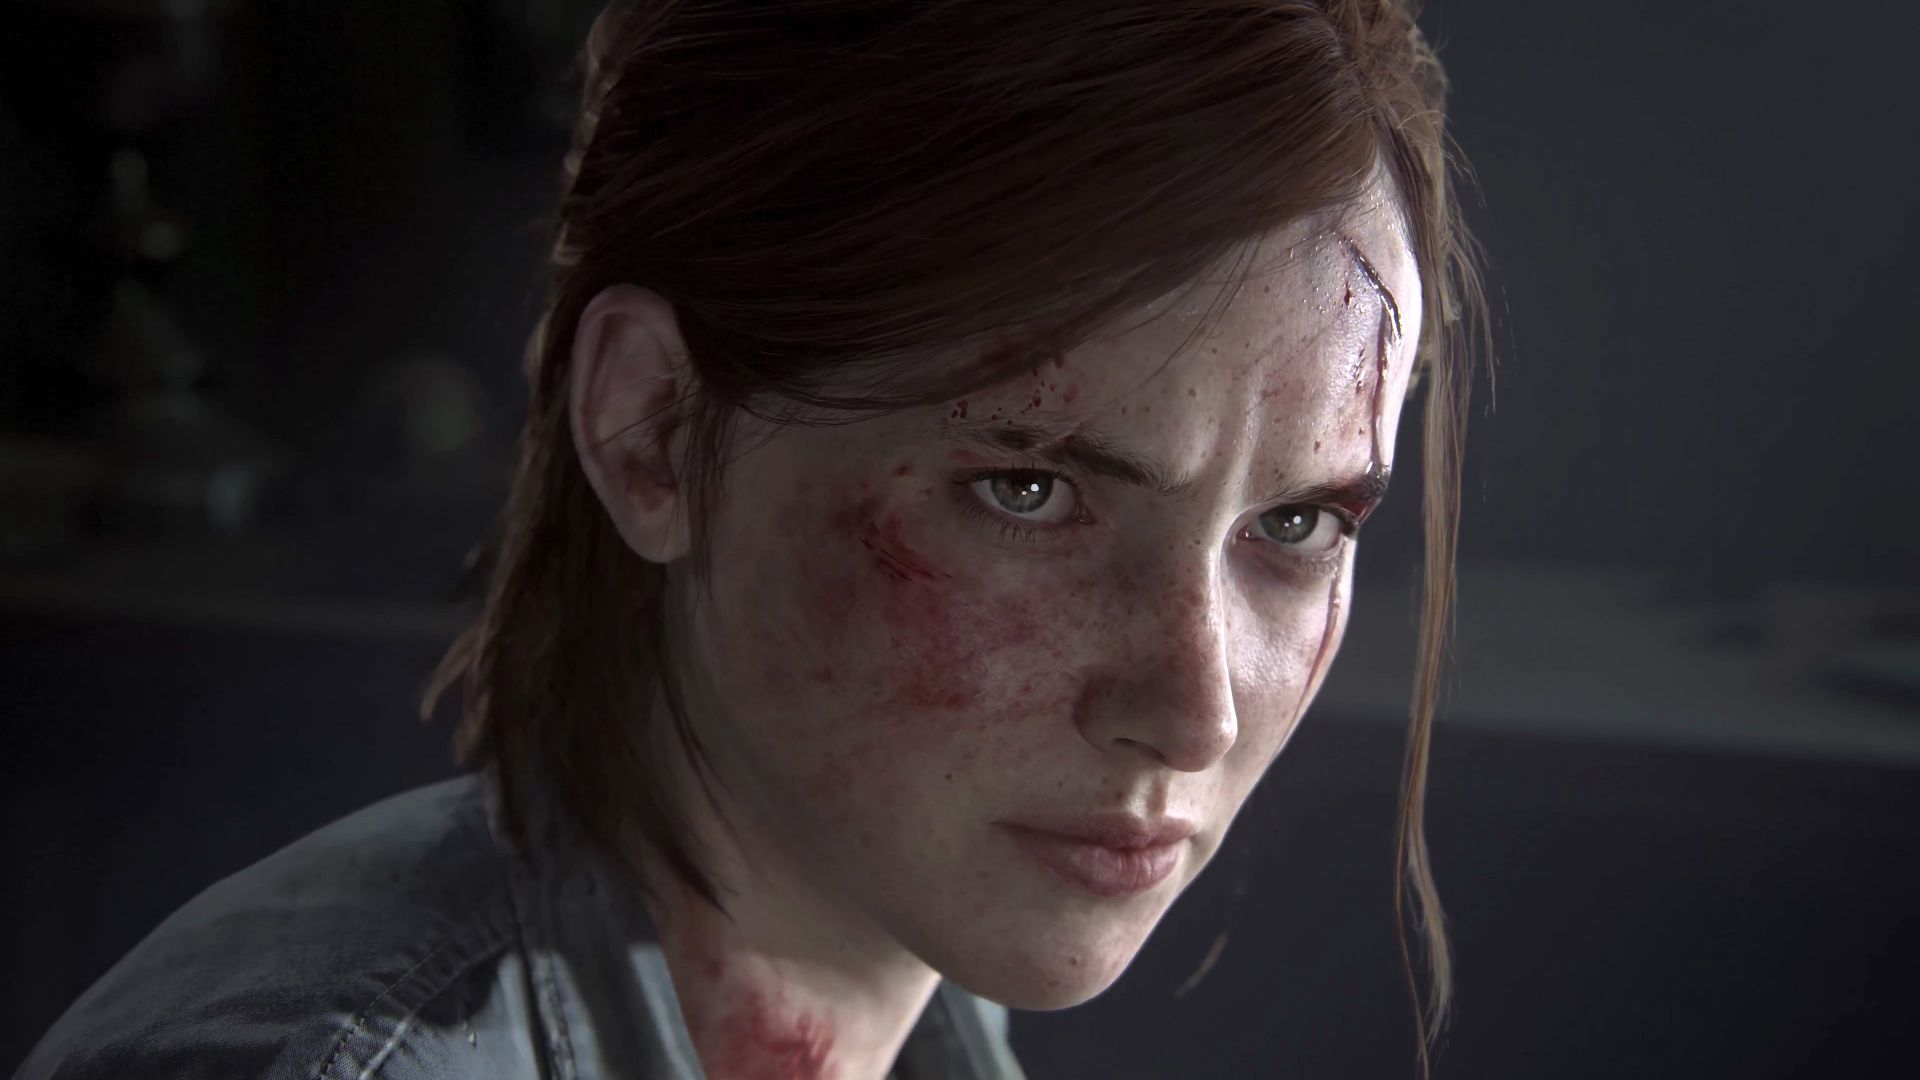 Wallpaper The Last Of Us Part 2 4k Screenshot Poster E3 2017